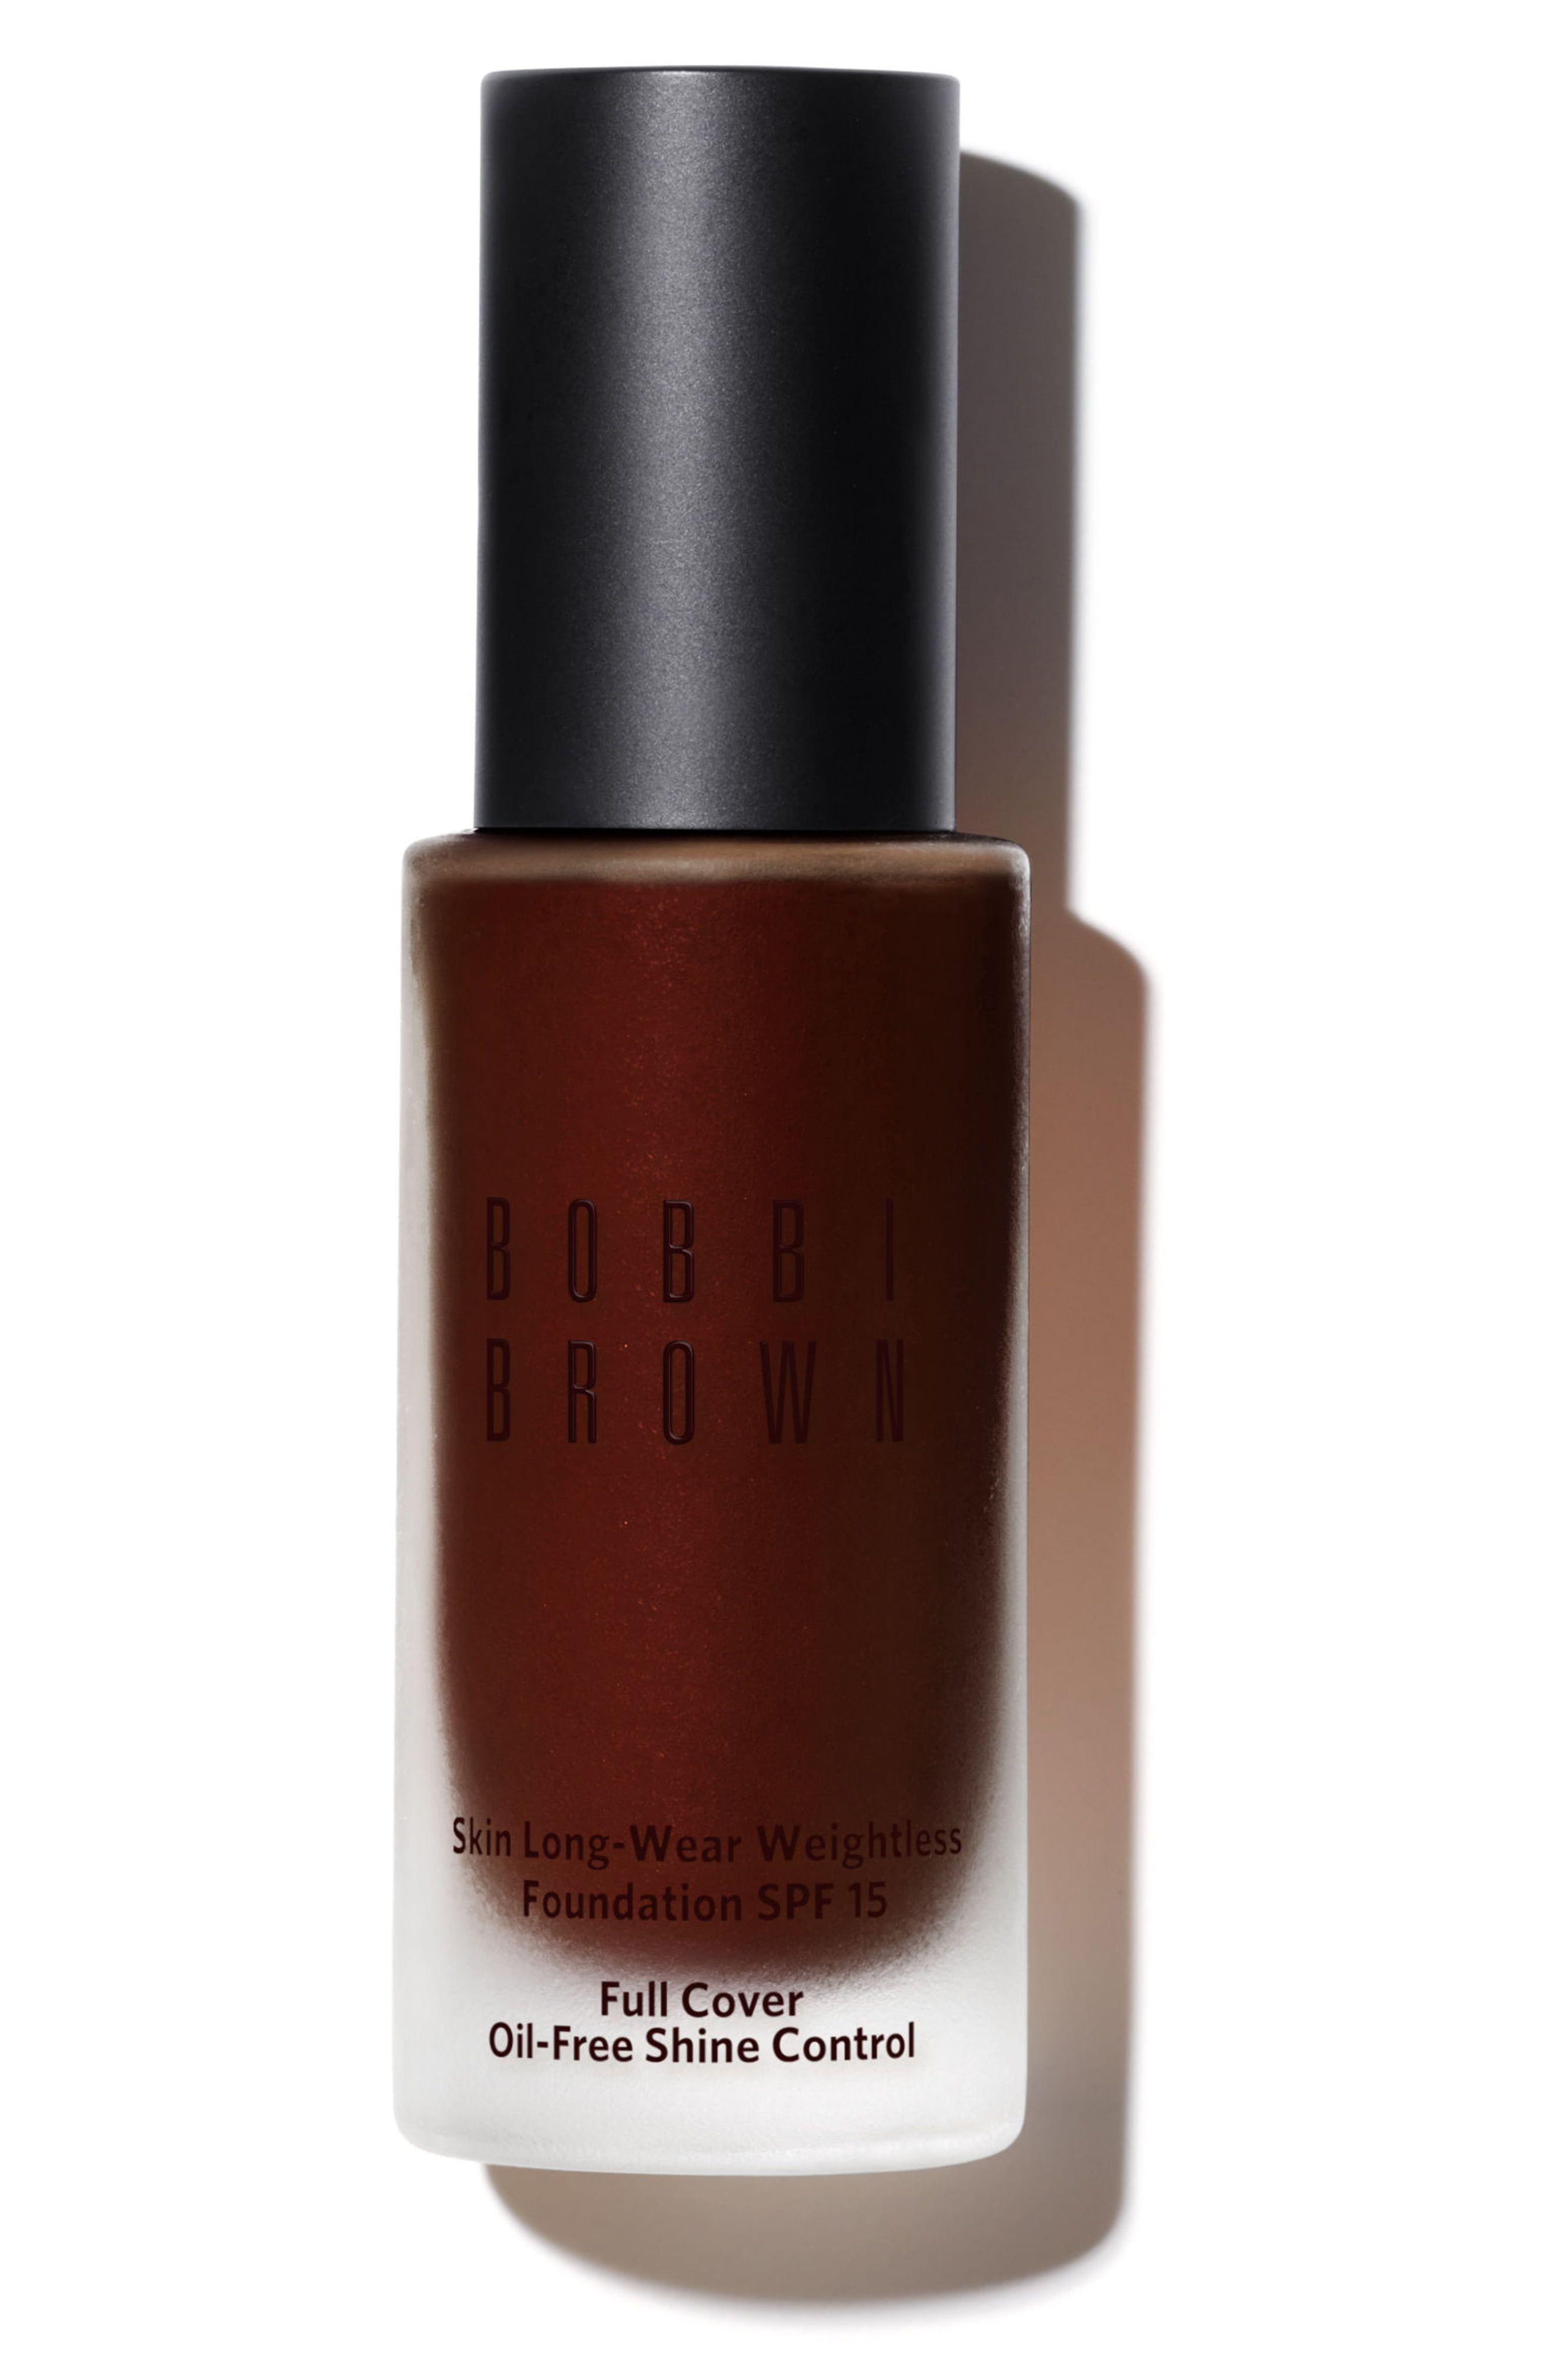 Bobbi Brown Skin Long-Wear Weightless Foundation SPF15 #8